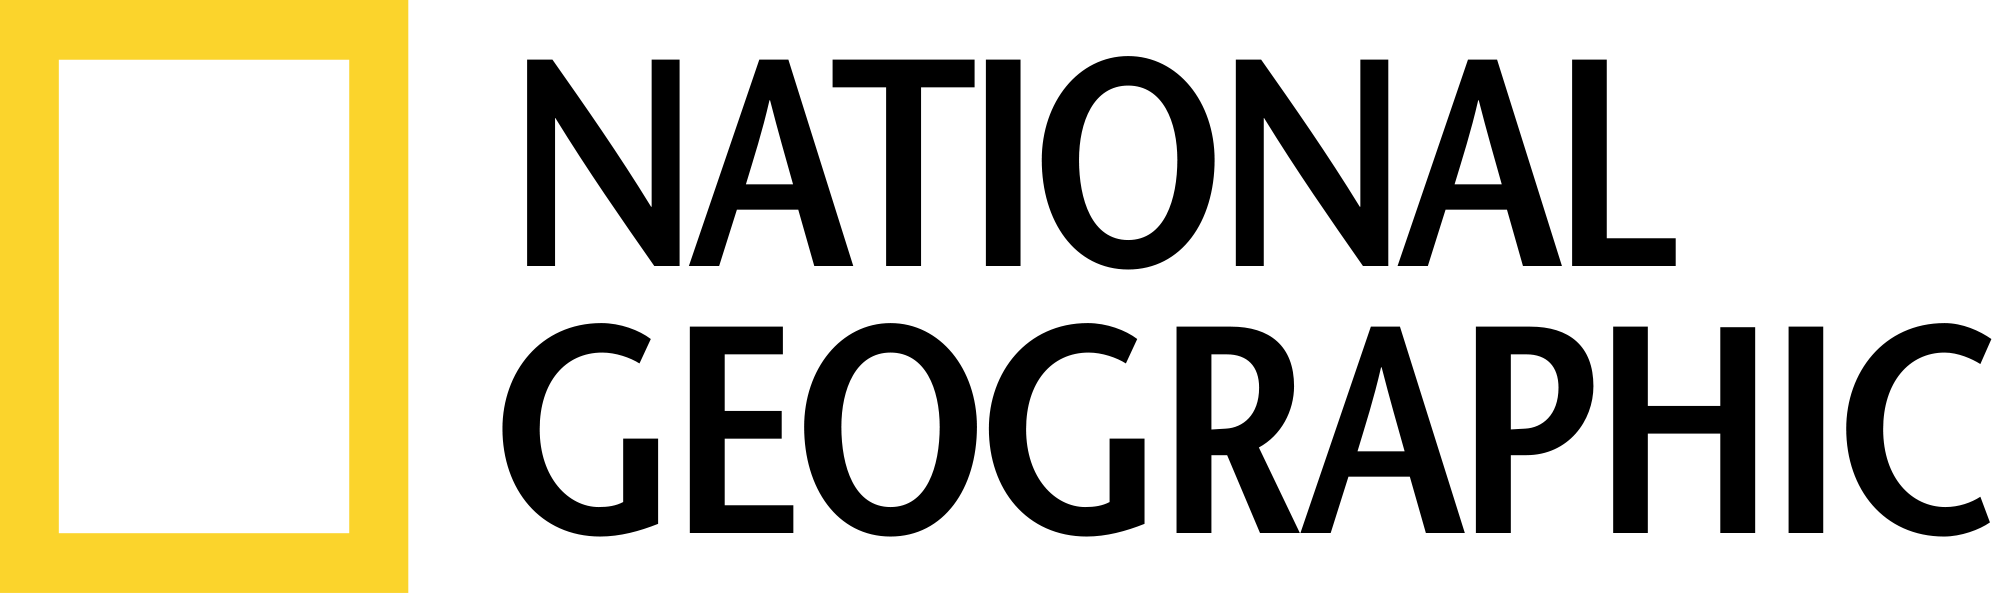 2000px-natgeologosvg.png